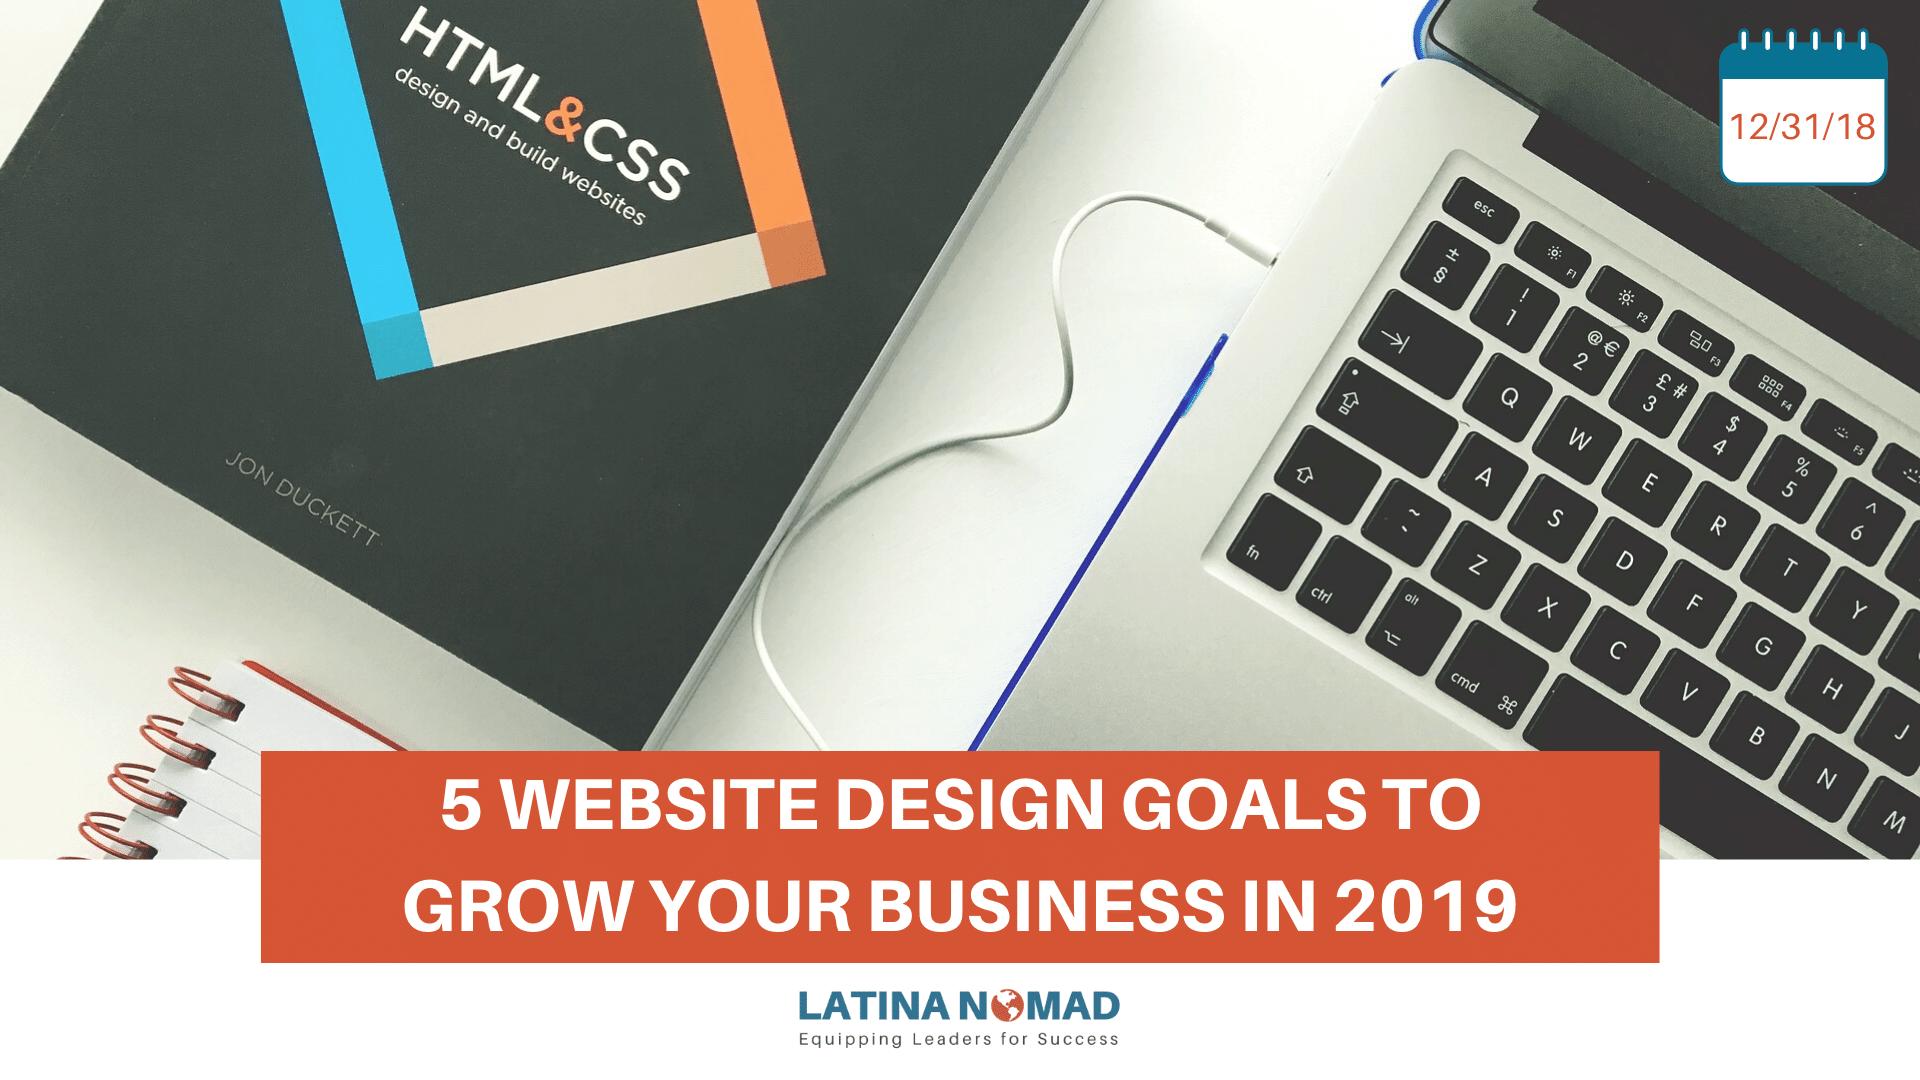 5 WEBSITE Design GOALS